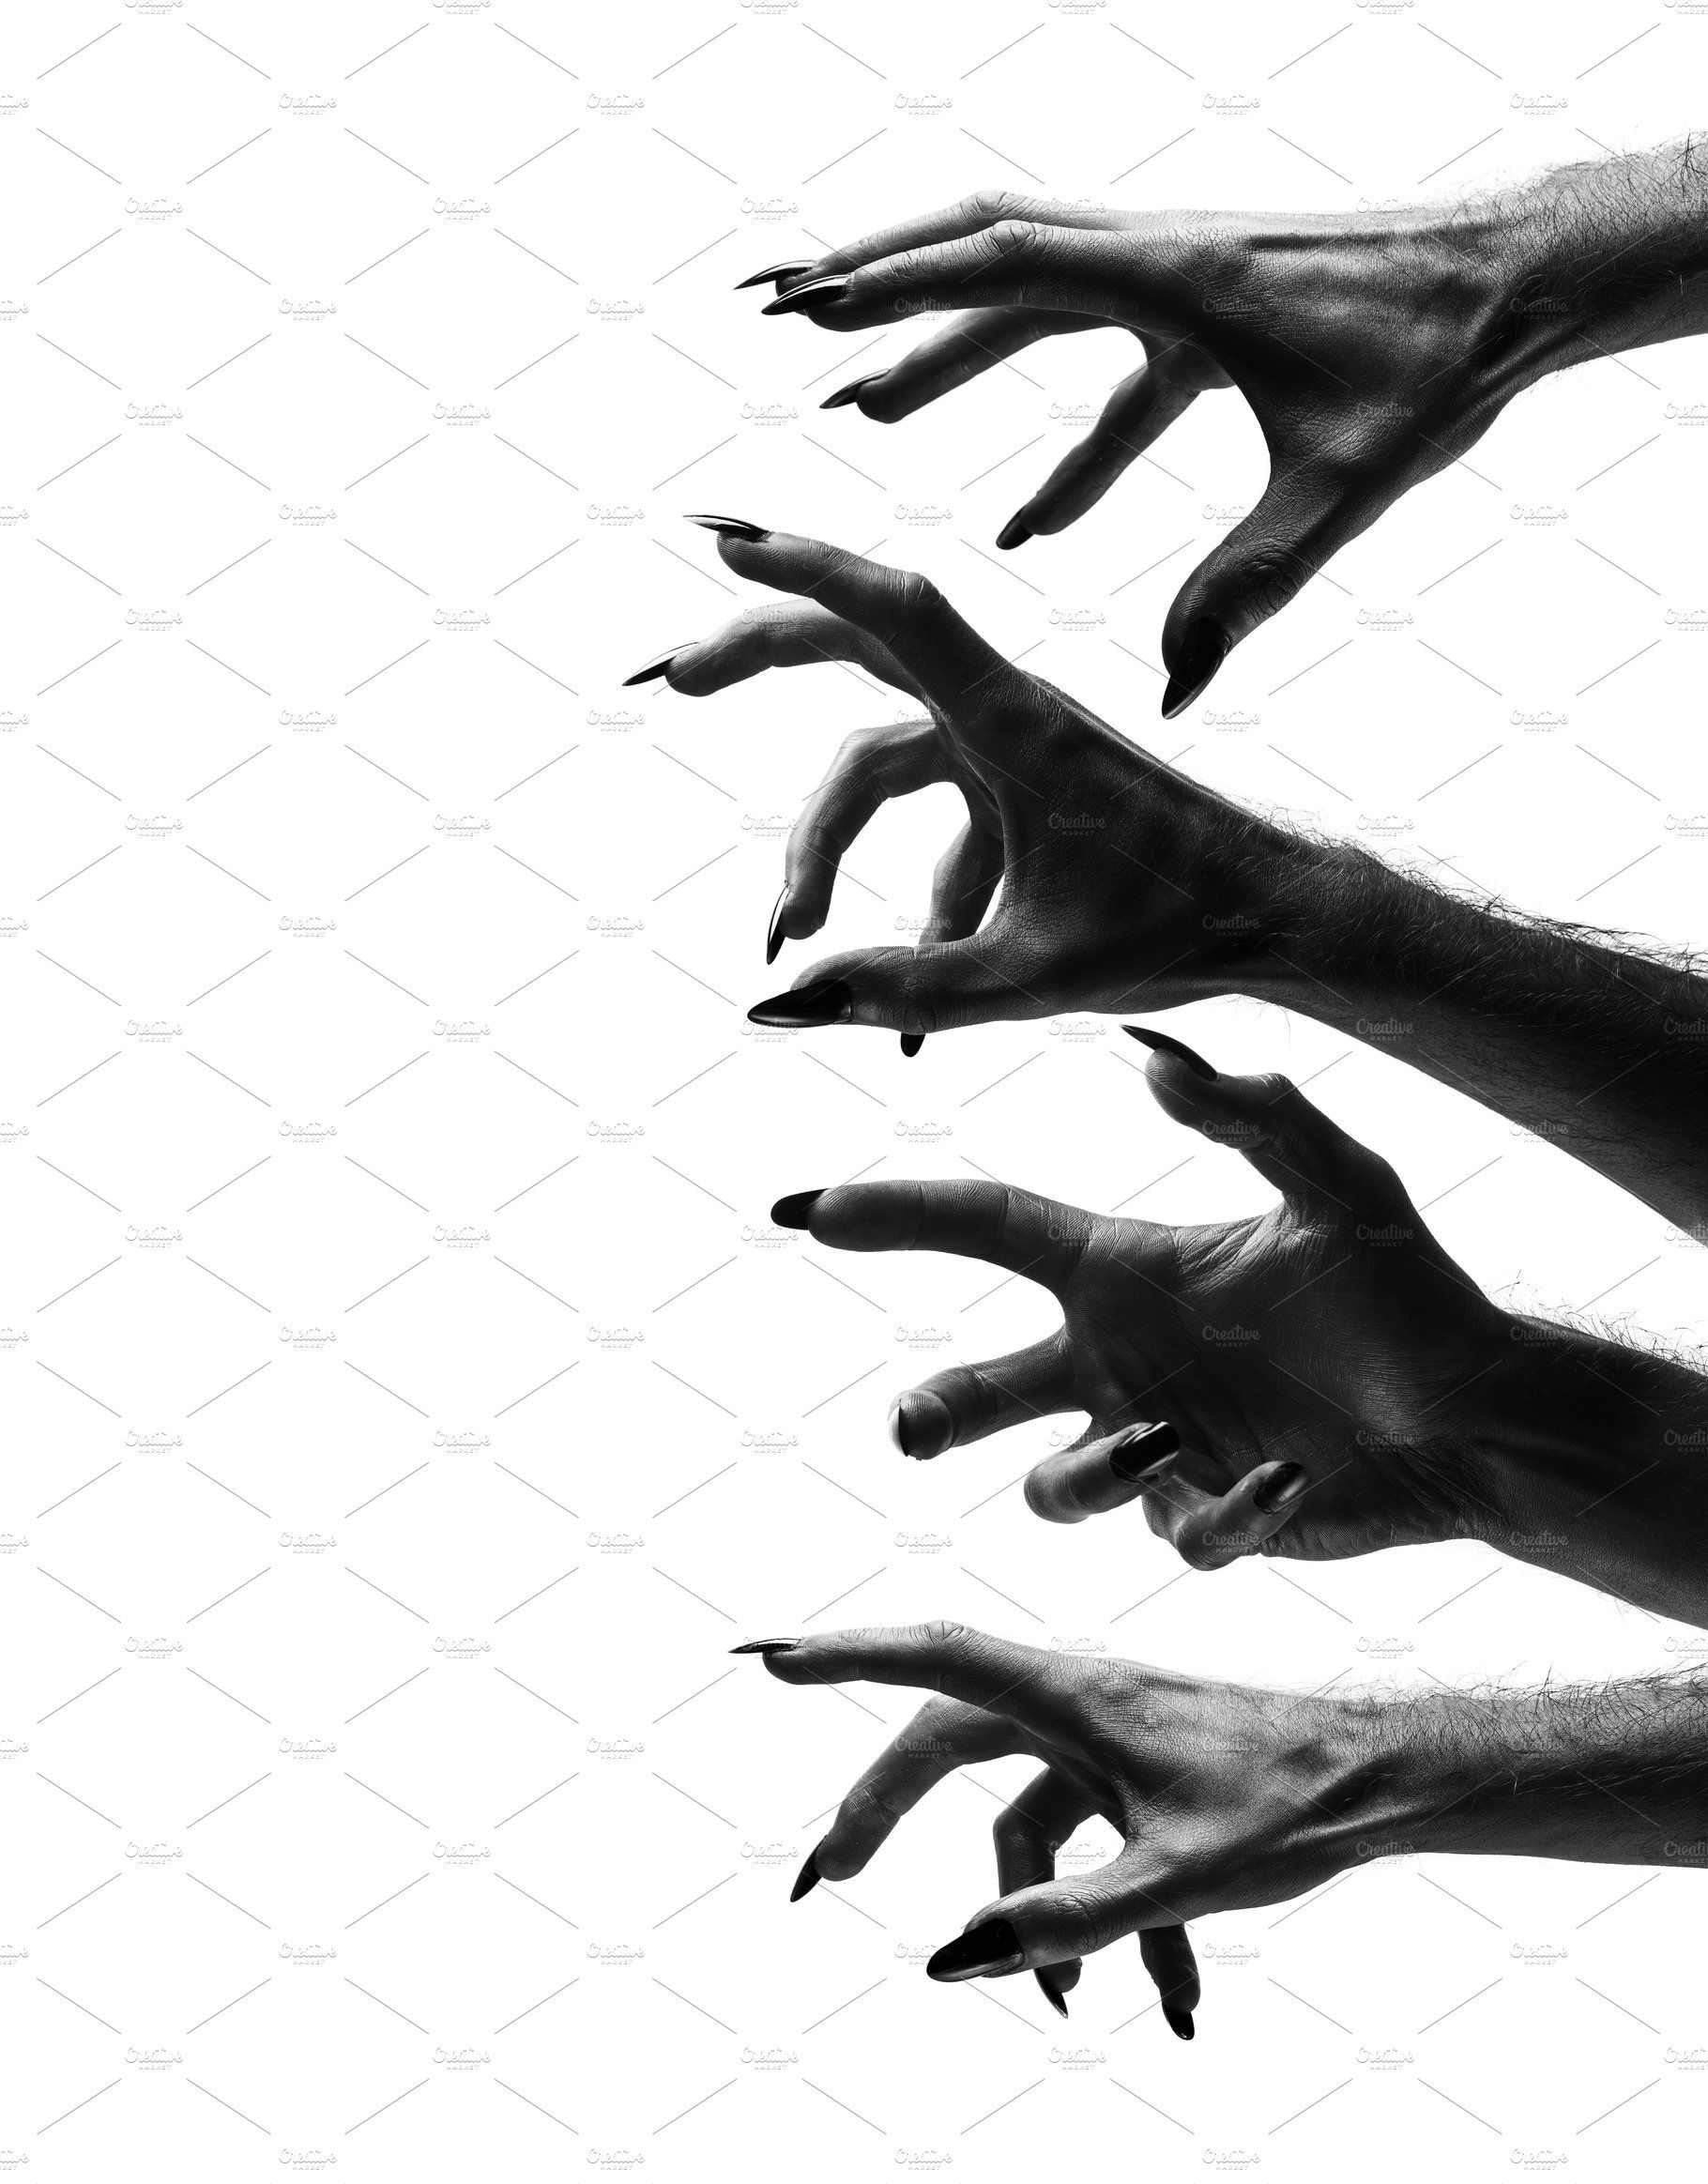 Black Creepy Halloween Monster Hand Creepy Hand Monster Hands Hand Reference